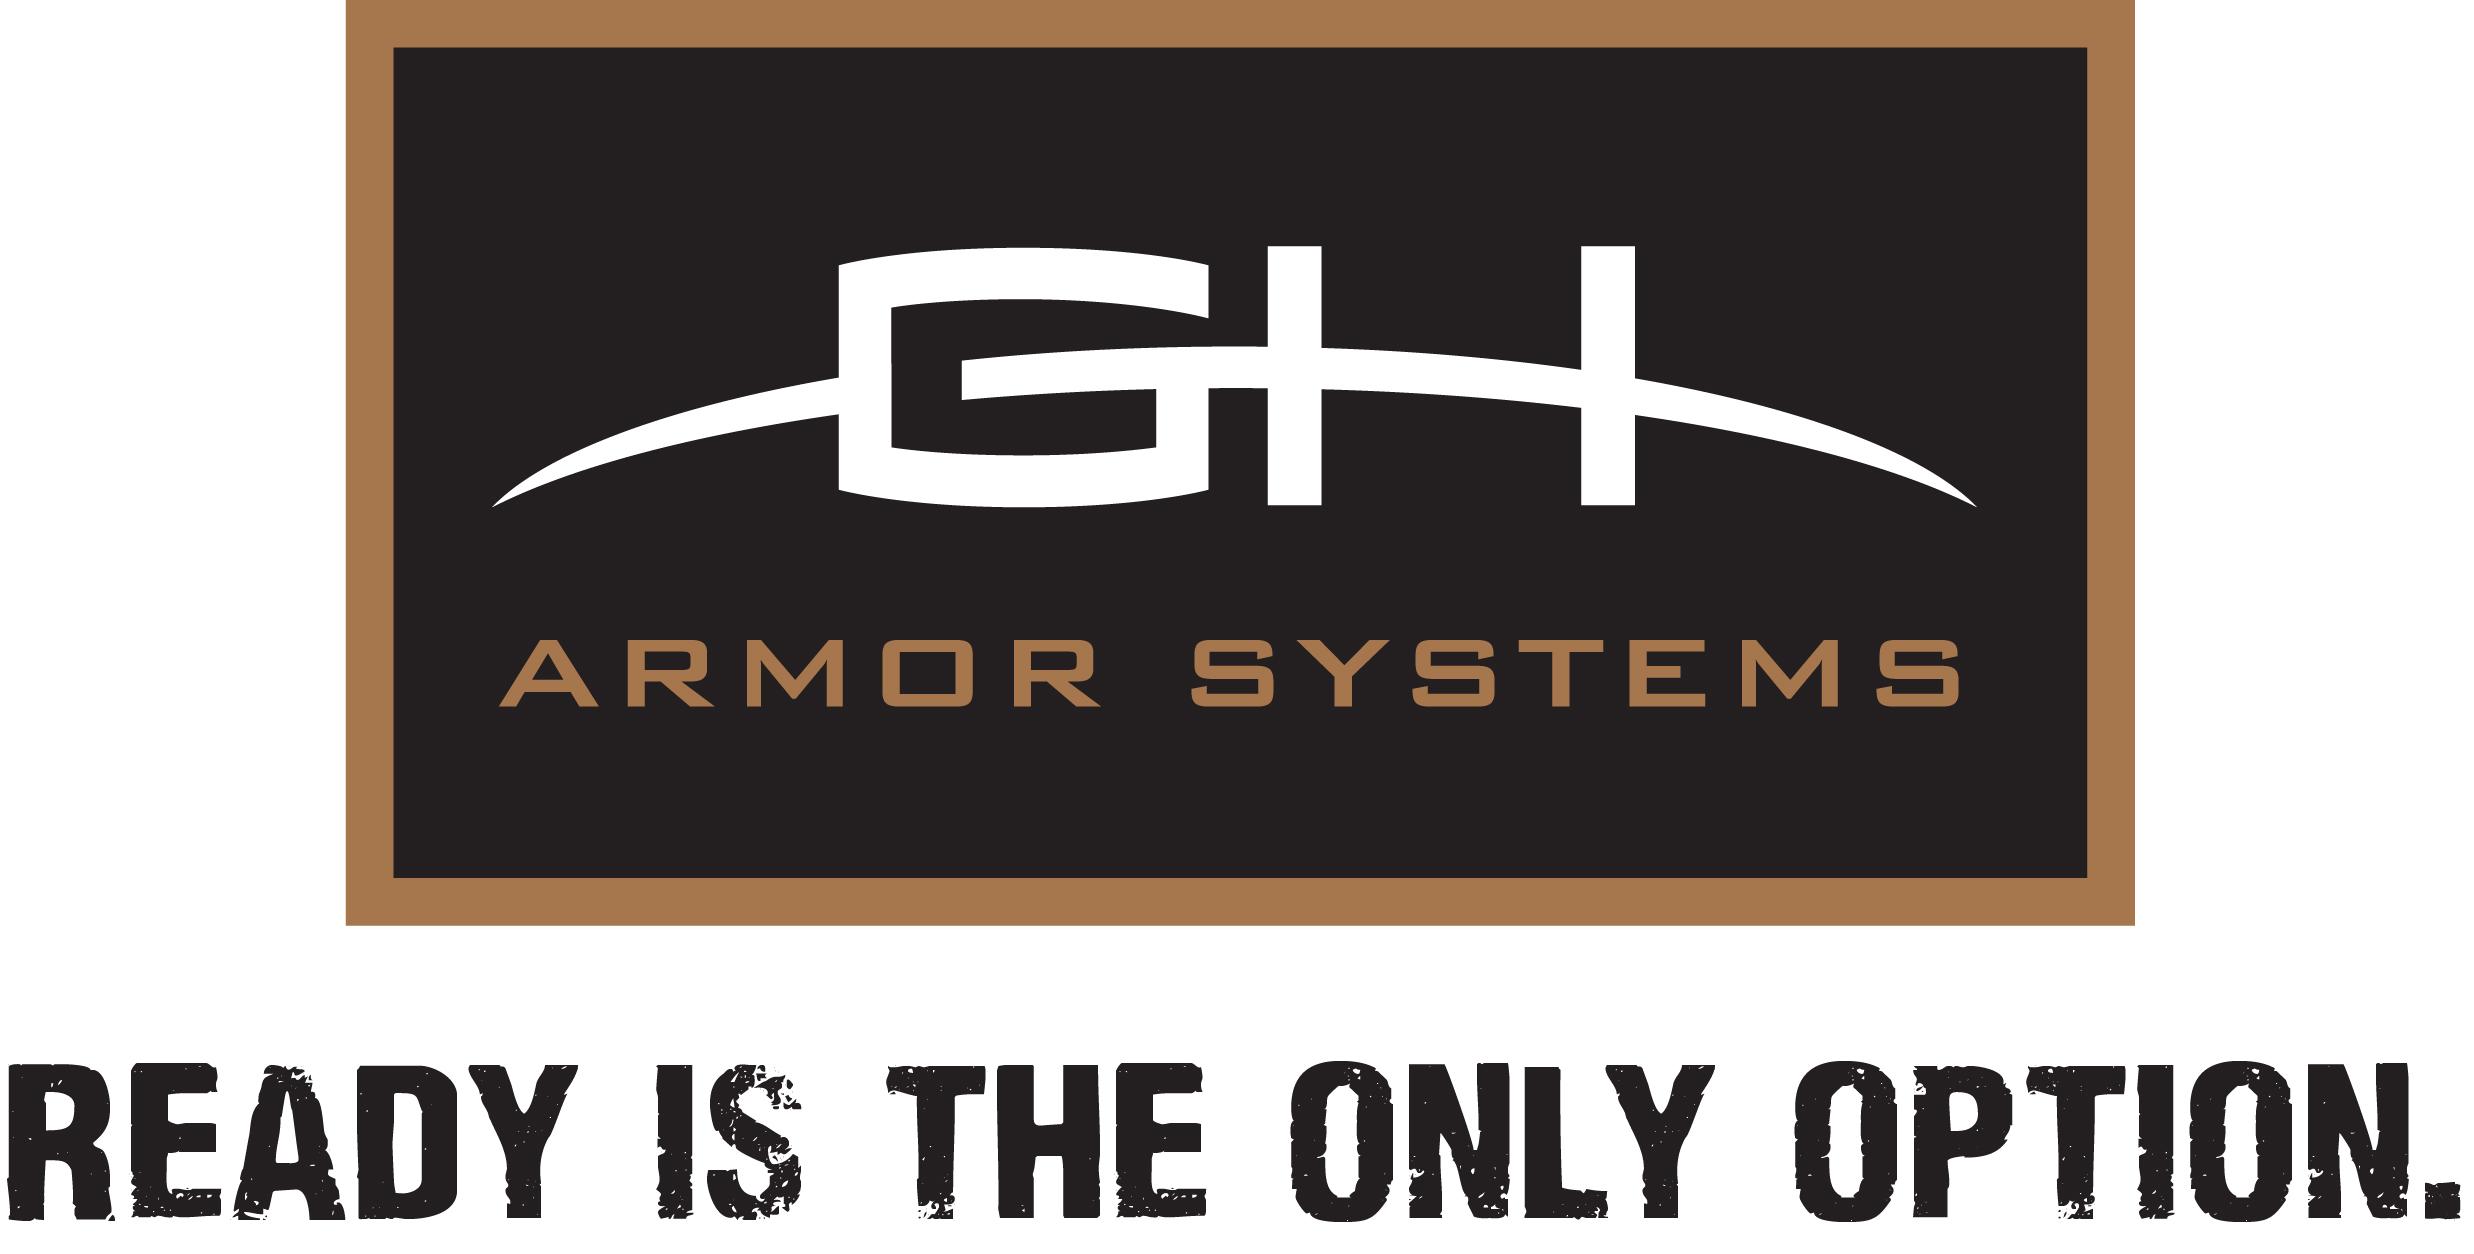 GHArmorSystemsLogo_print180828.jpg